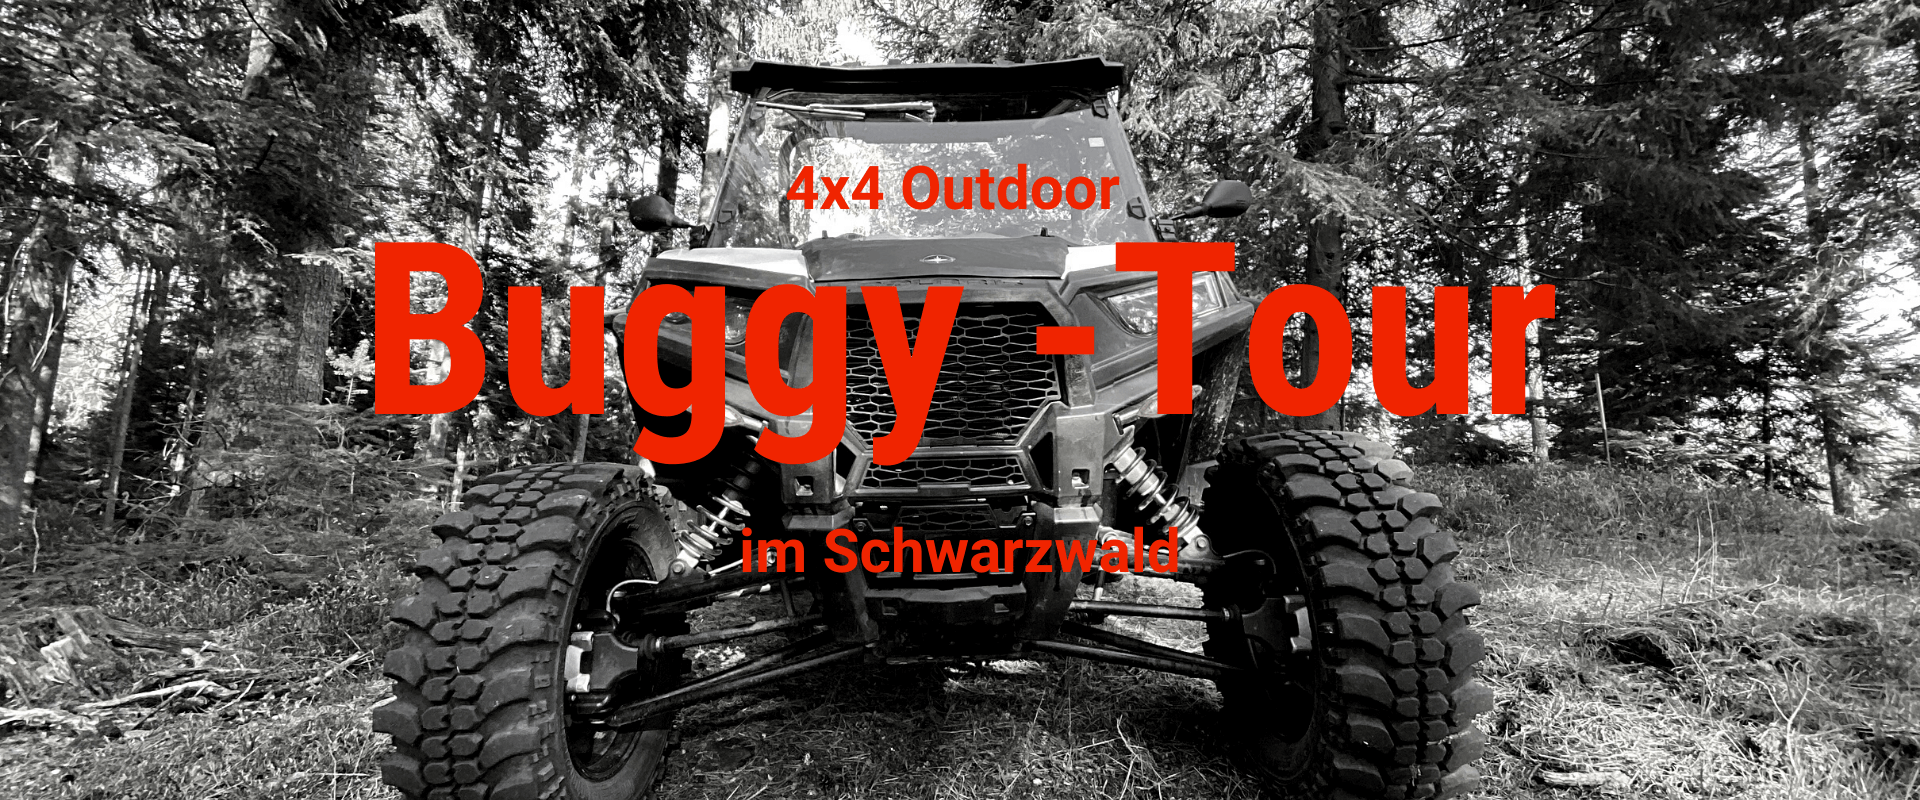 schwarzwald-erlebnis-buggy-tour